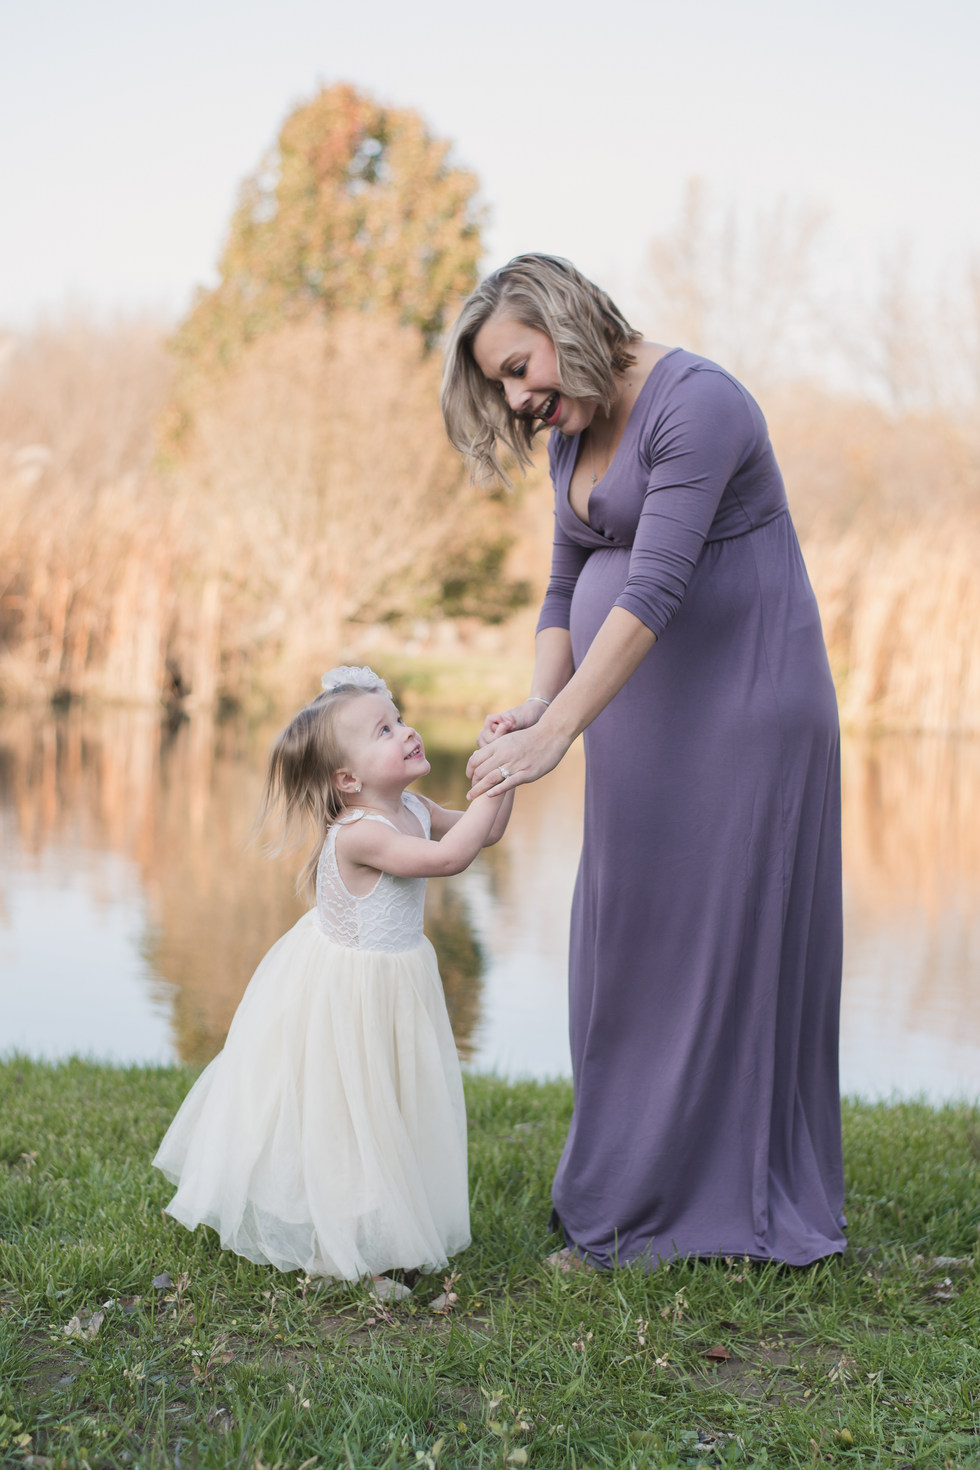 gs photos family photography-34.jpg